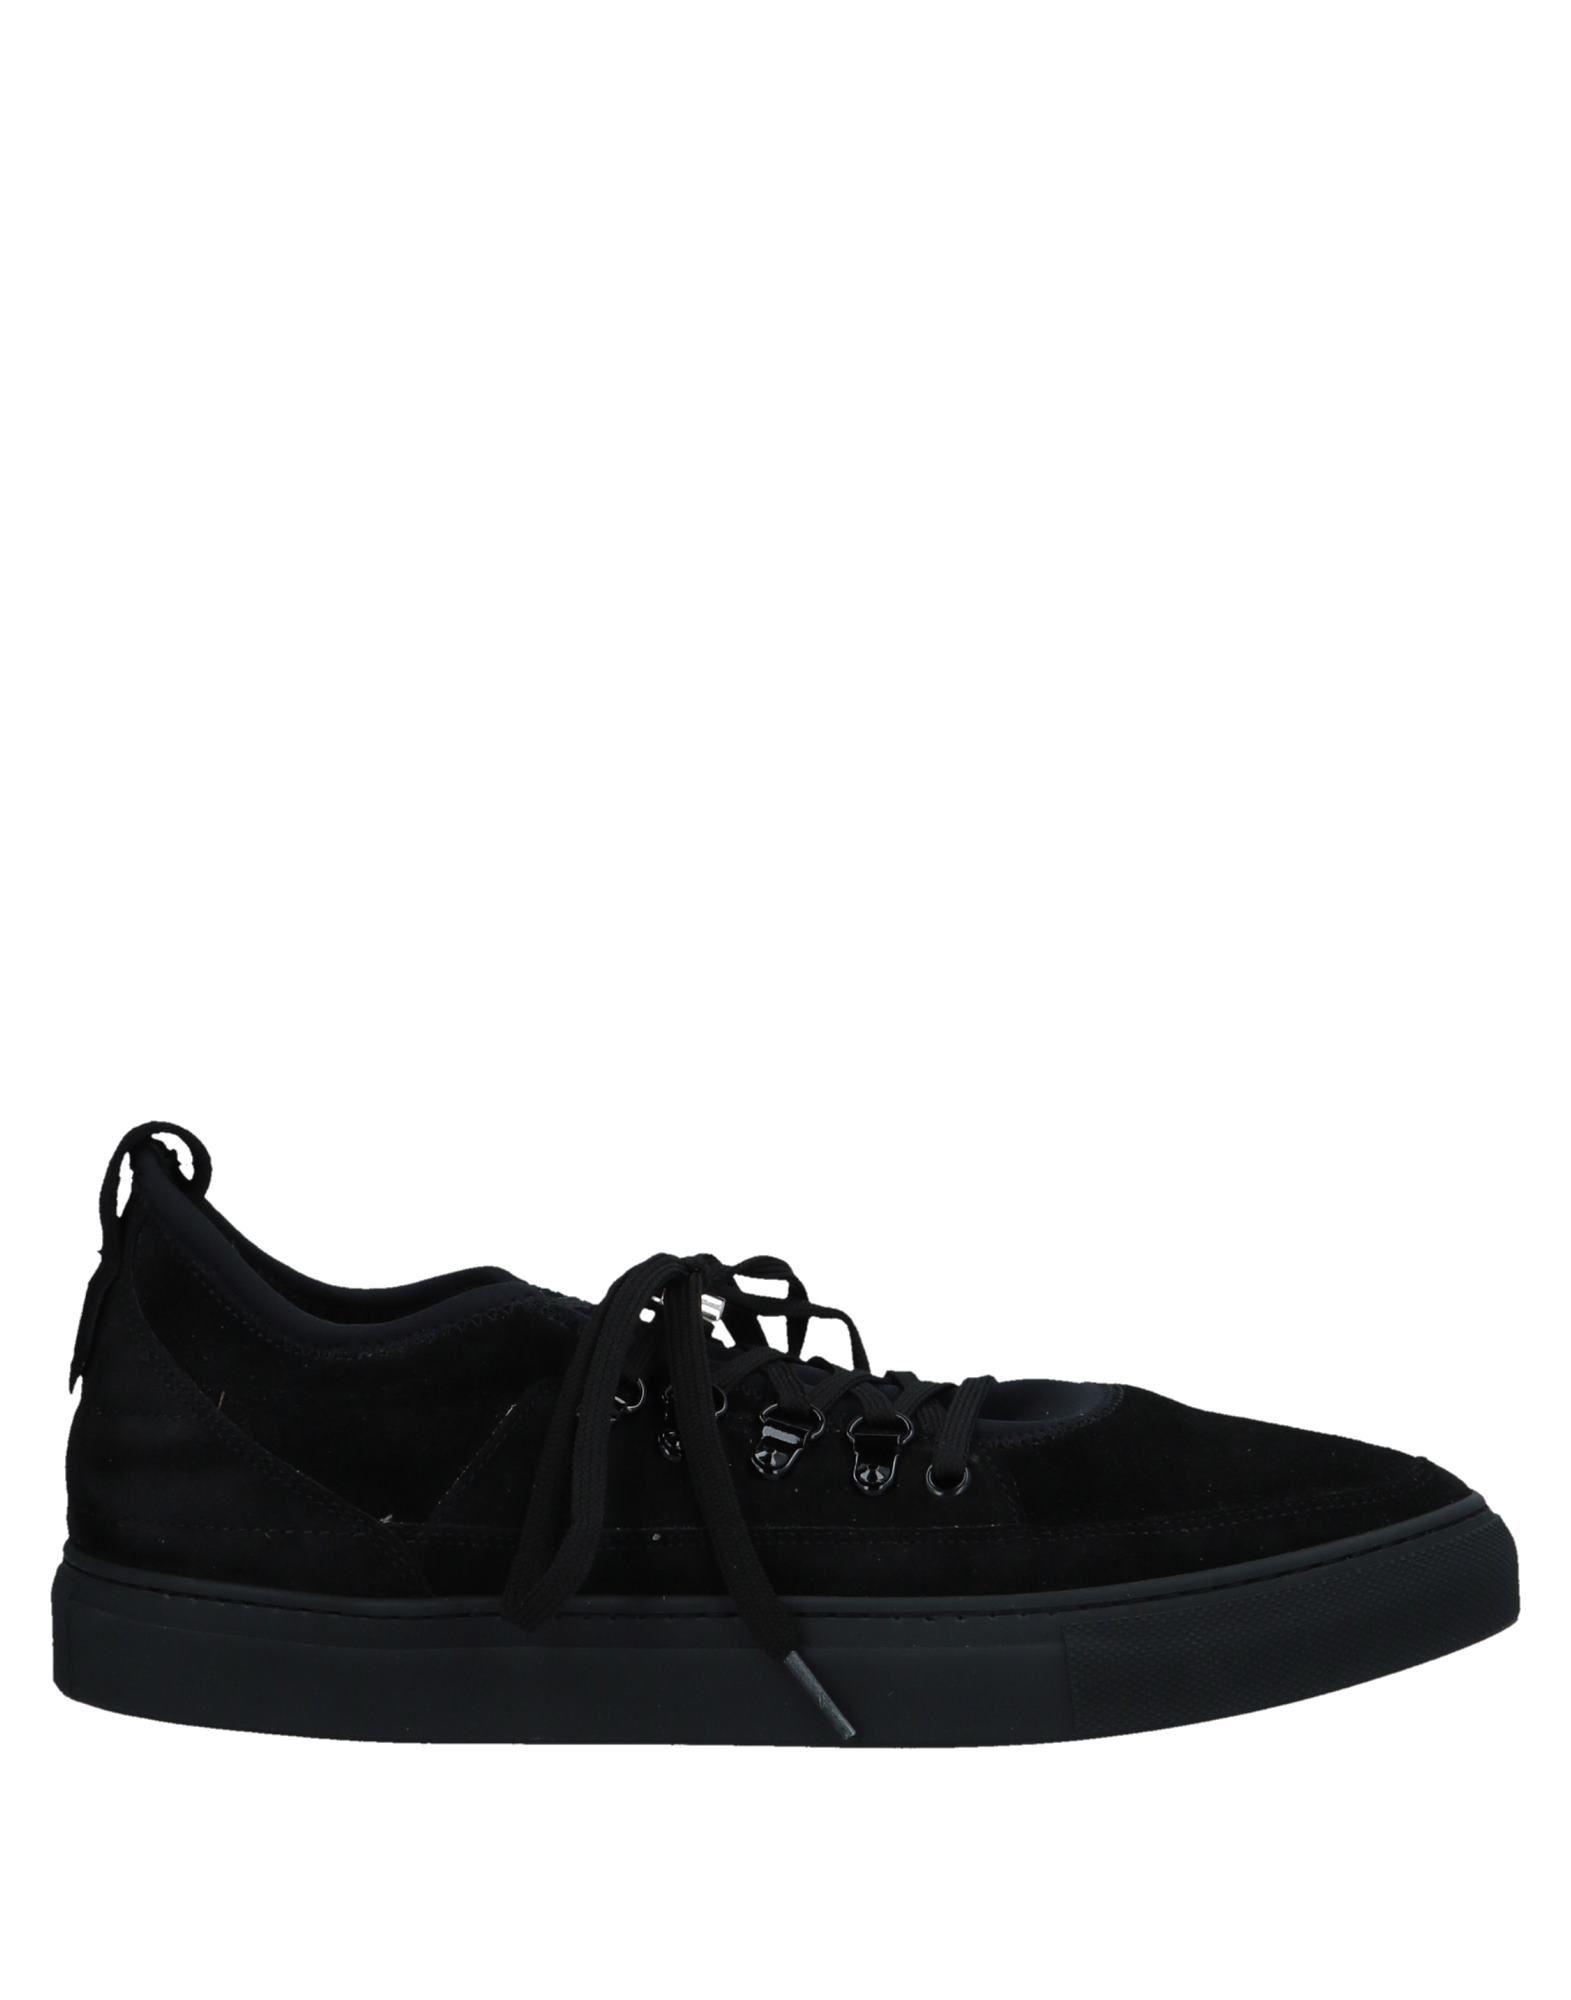 Alessandro Dell'acqua Sneakers Herren  11539090OT Neue Schuhe